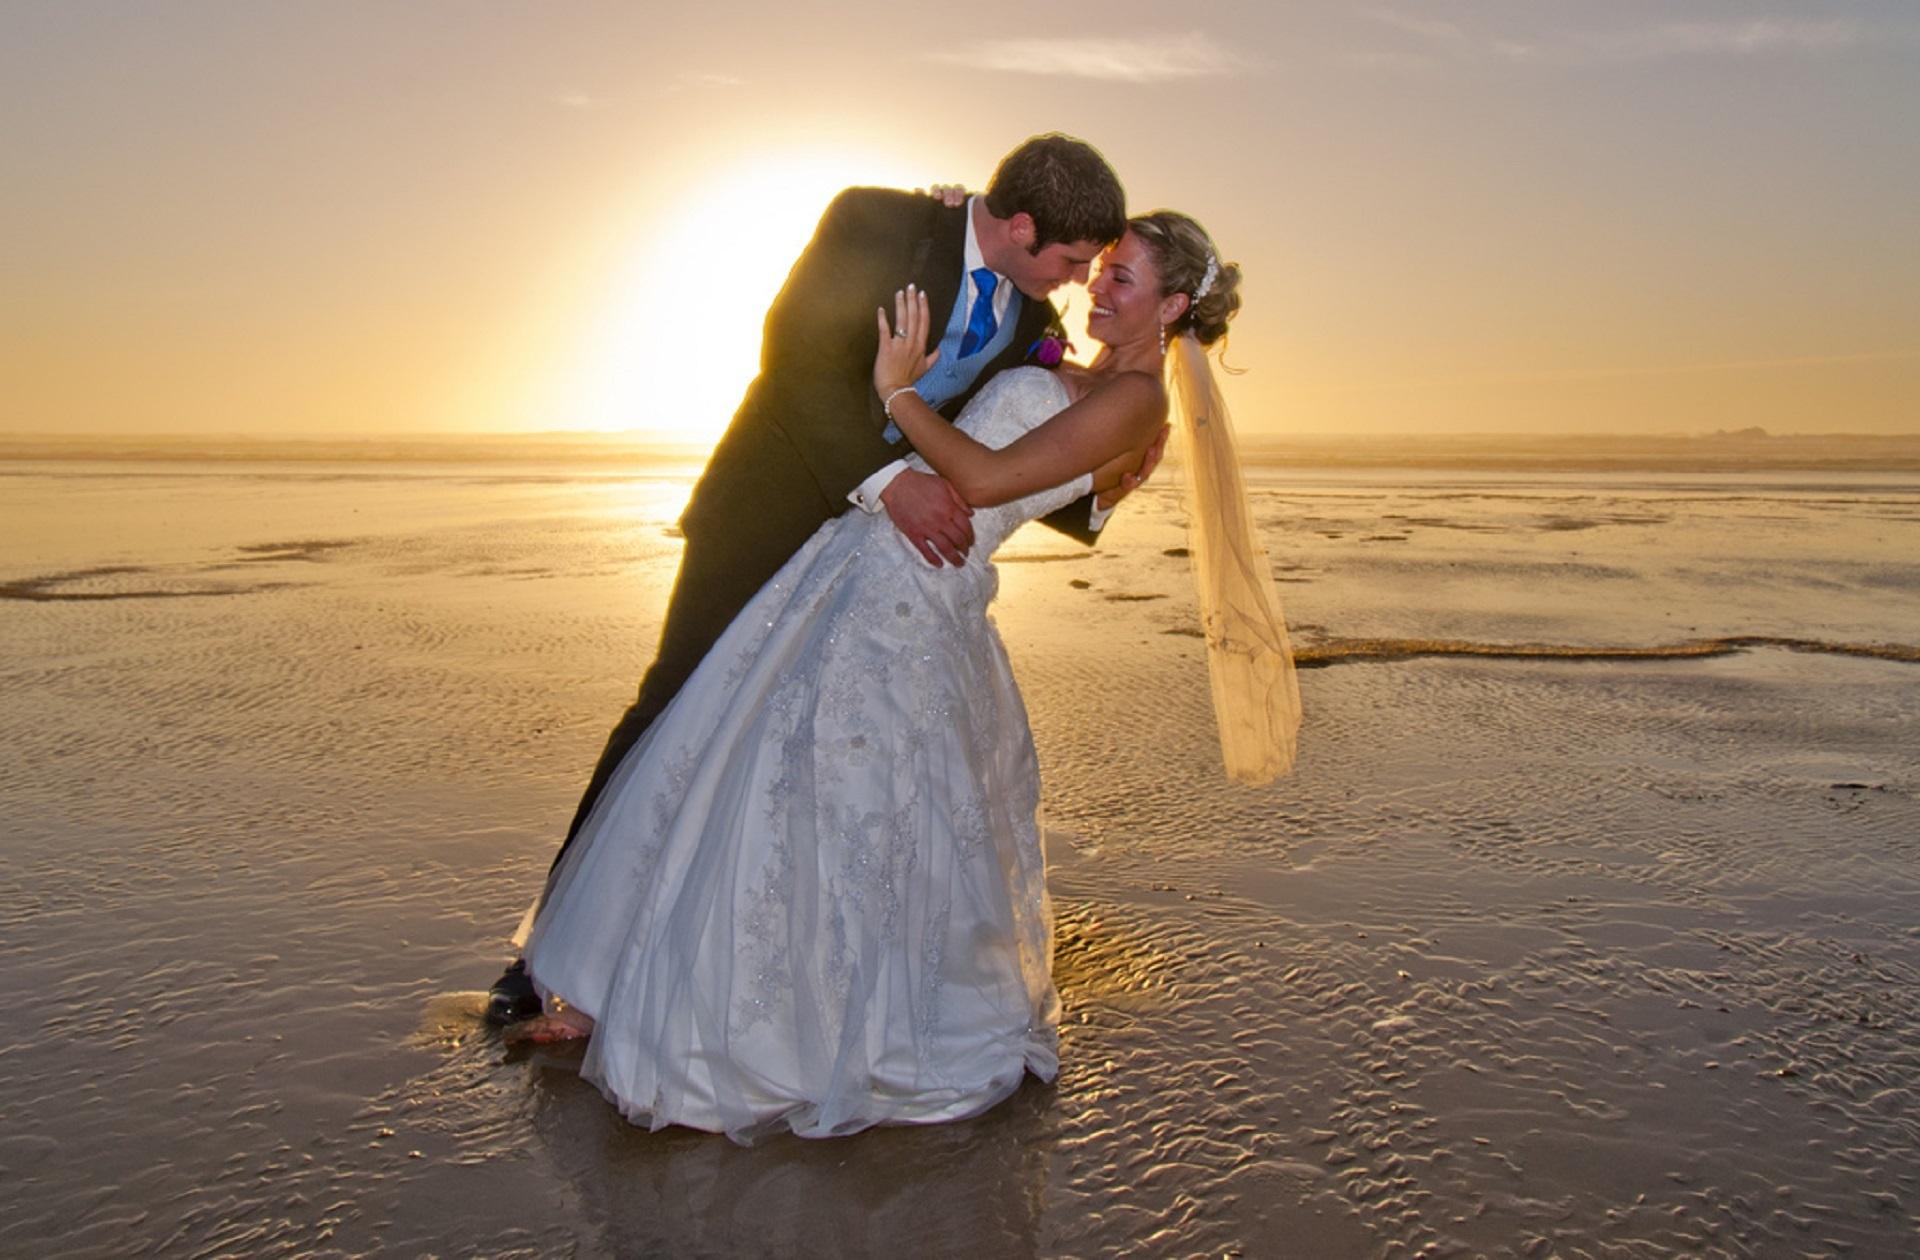 man-beach-sea-sand-ocean-woman-911700-pxhere.com